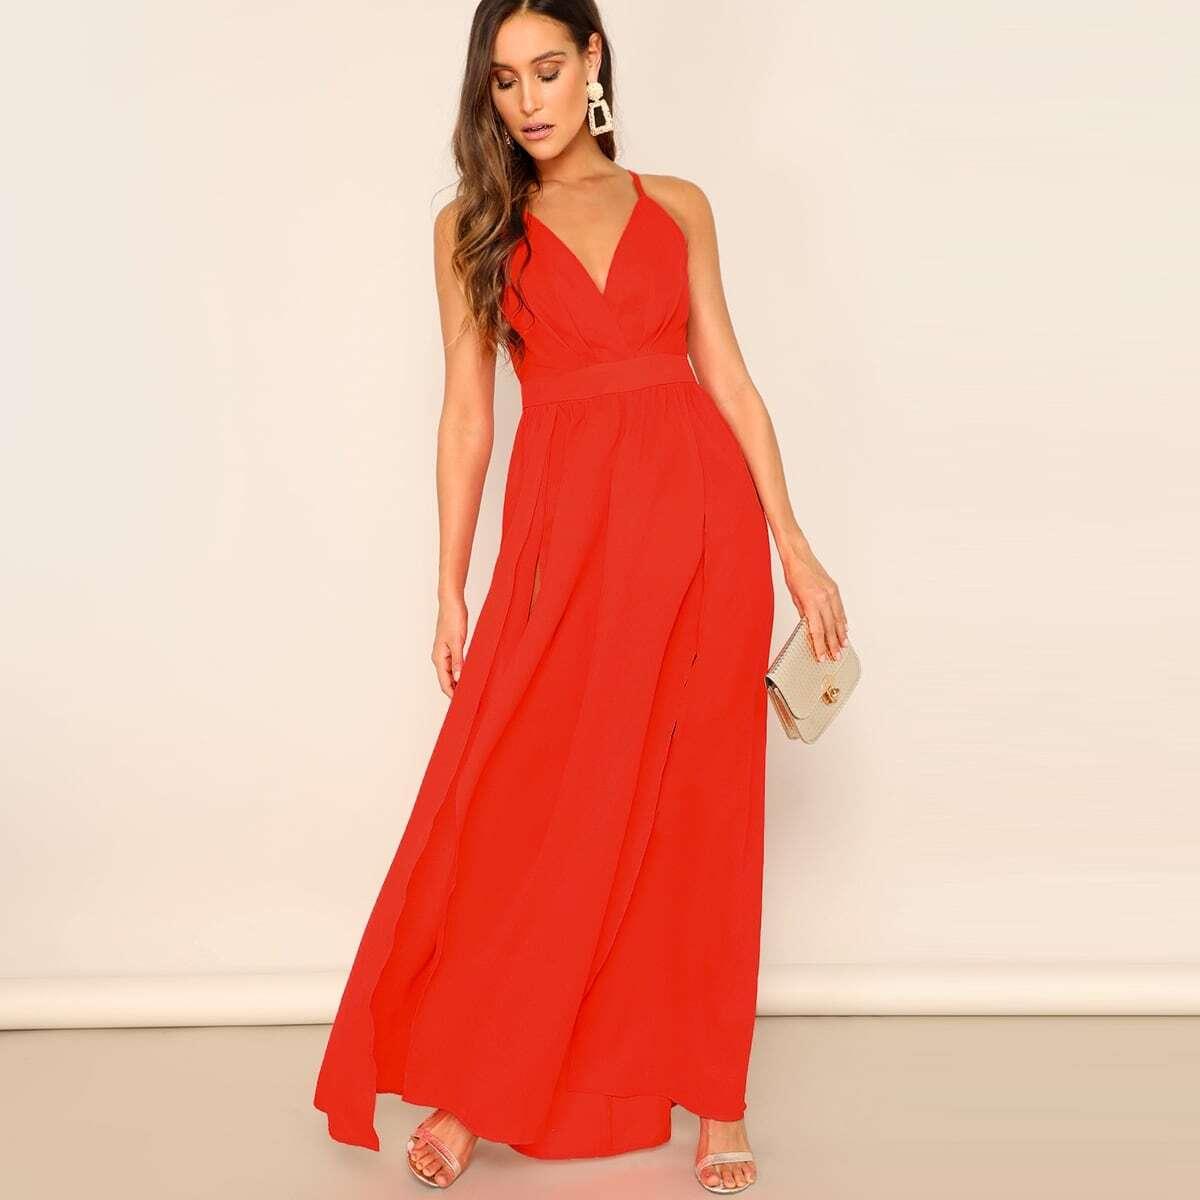 M-Slit Cross Back Neon Red Cami Prom Dress